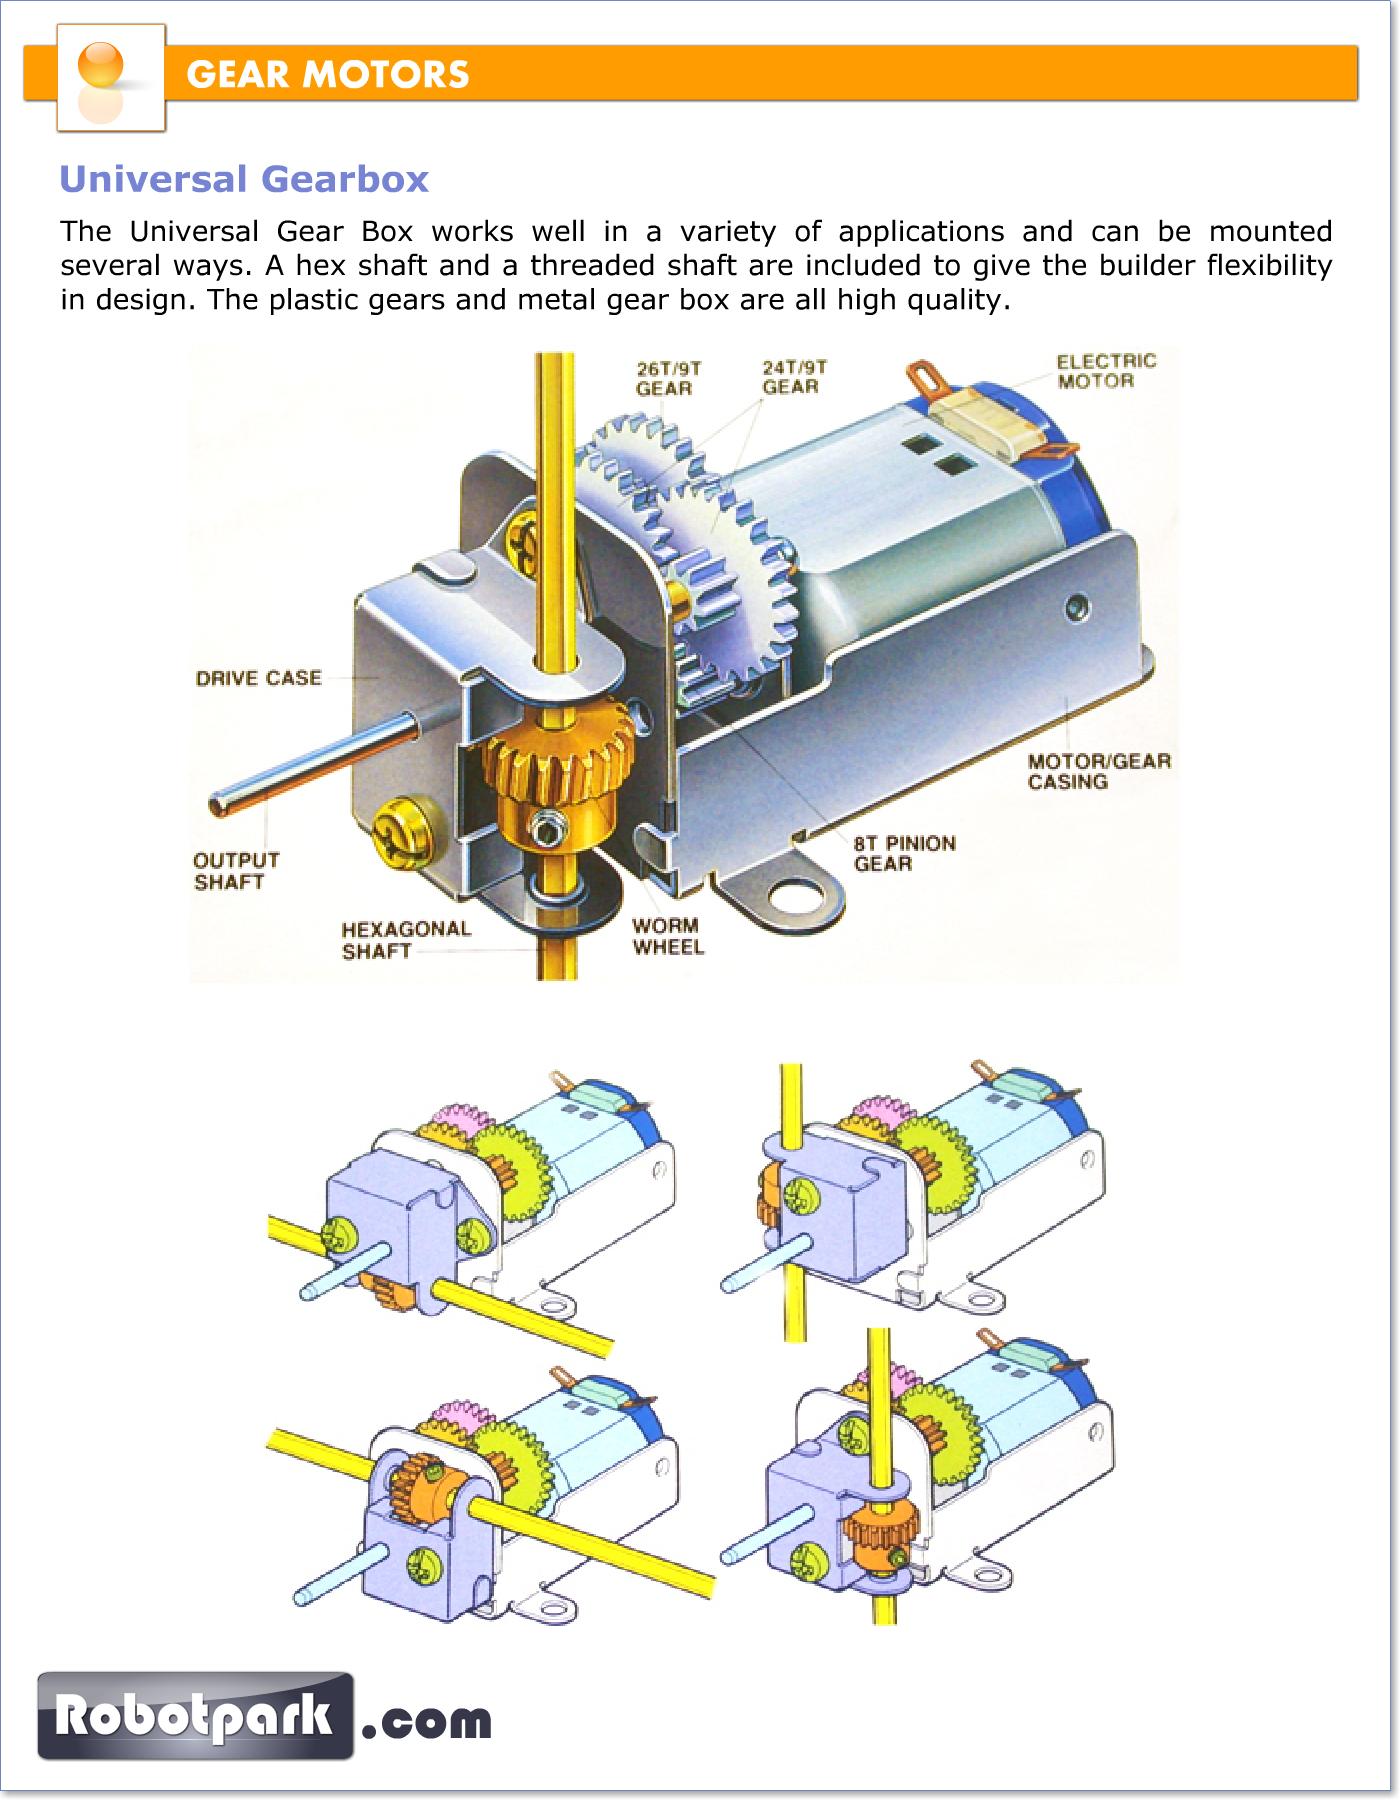 electric rc car diagram wiring diagram world electric rc car wiring diagram [ 1400 x 1800 Pixel ]